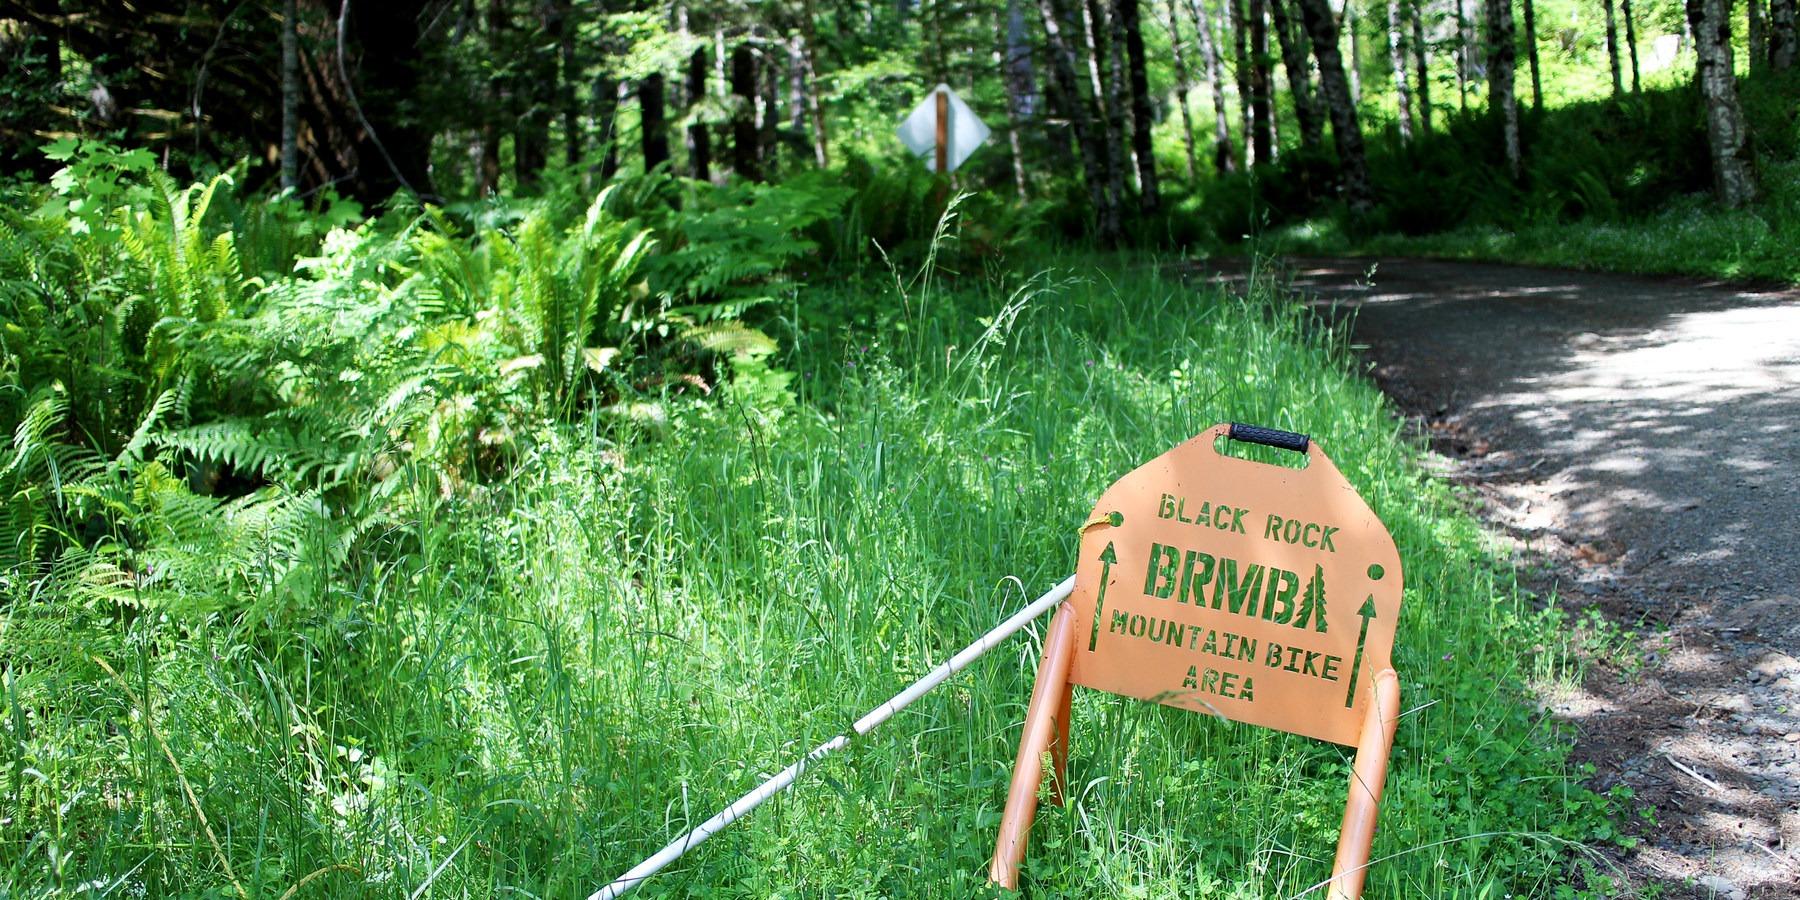 Black Rock Mountain Bike Bicycling And The Best Bike Ideas